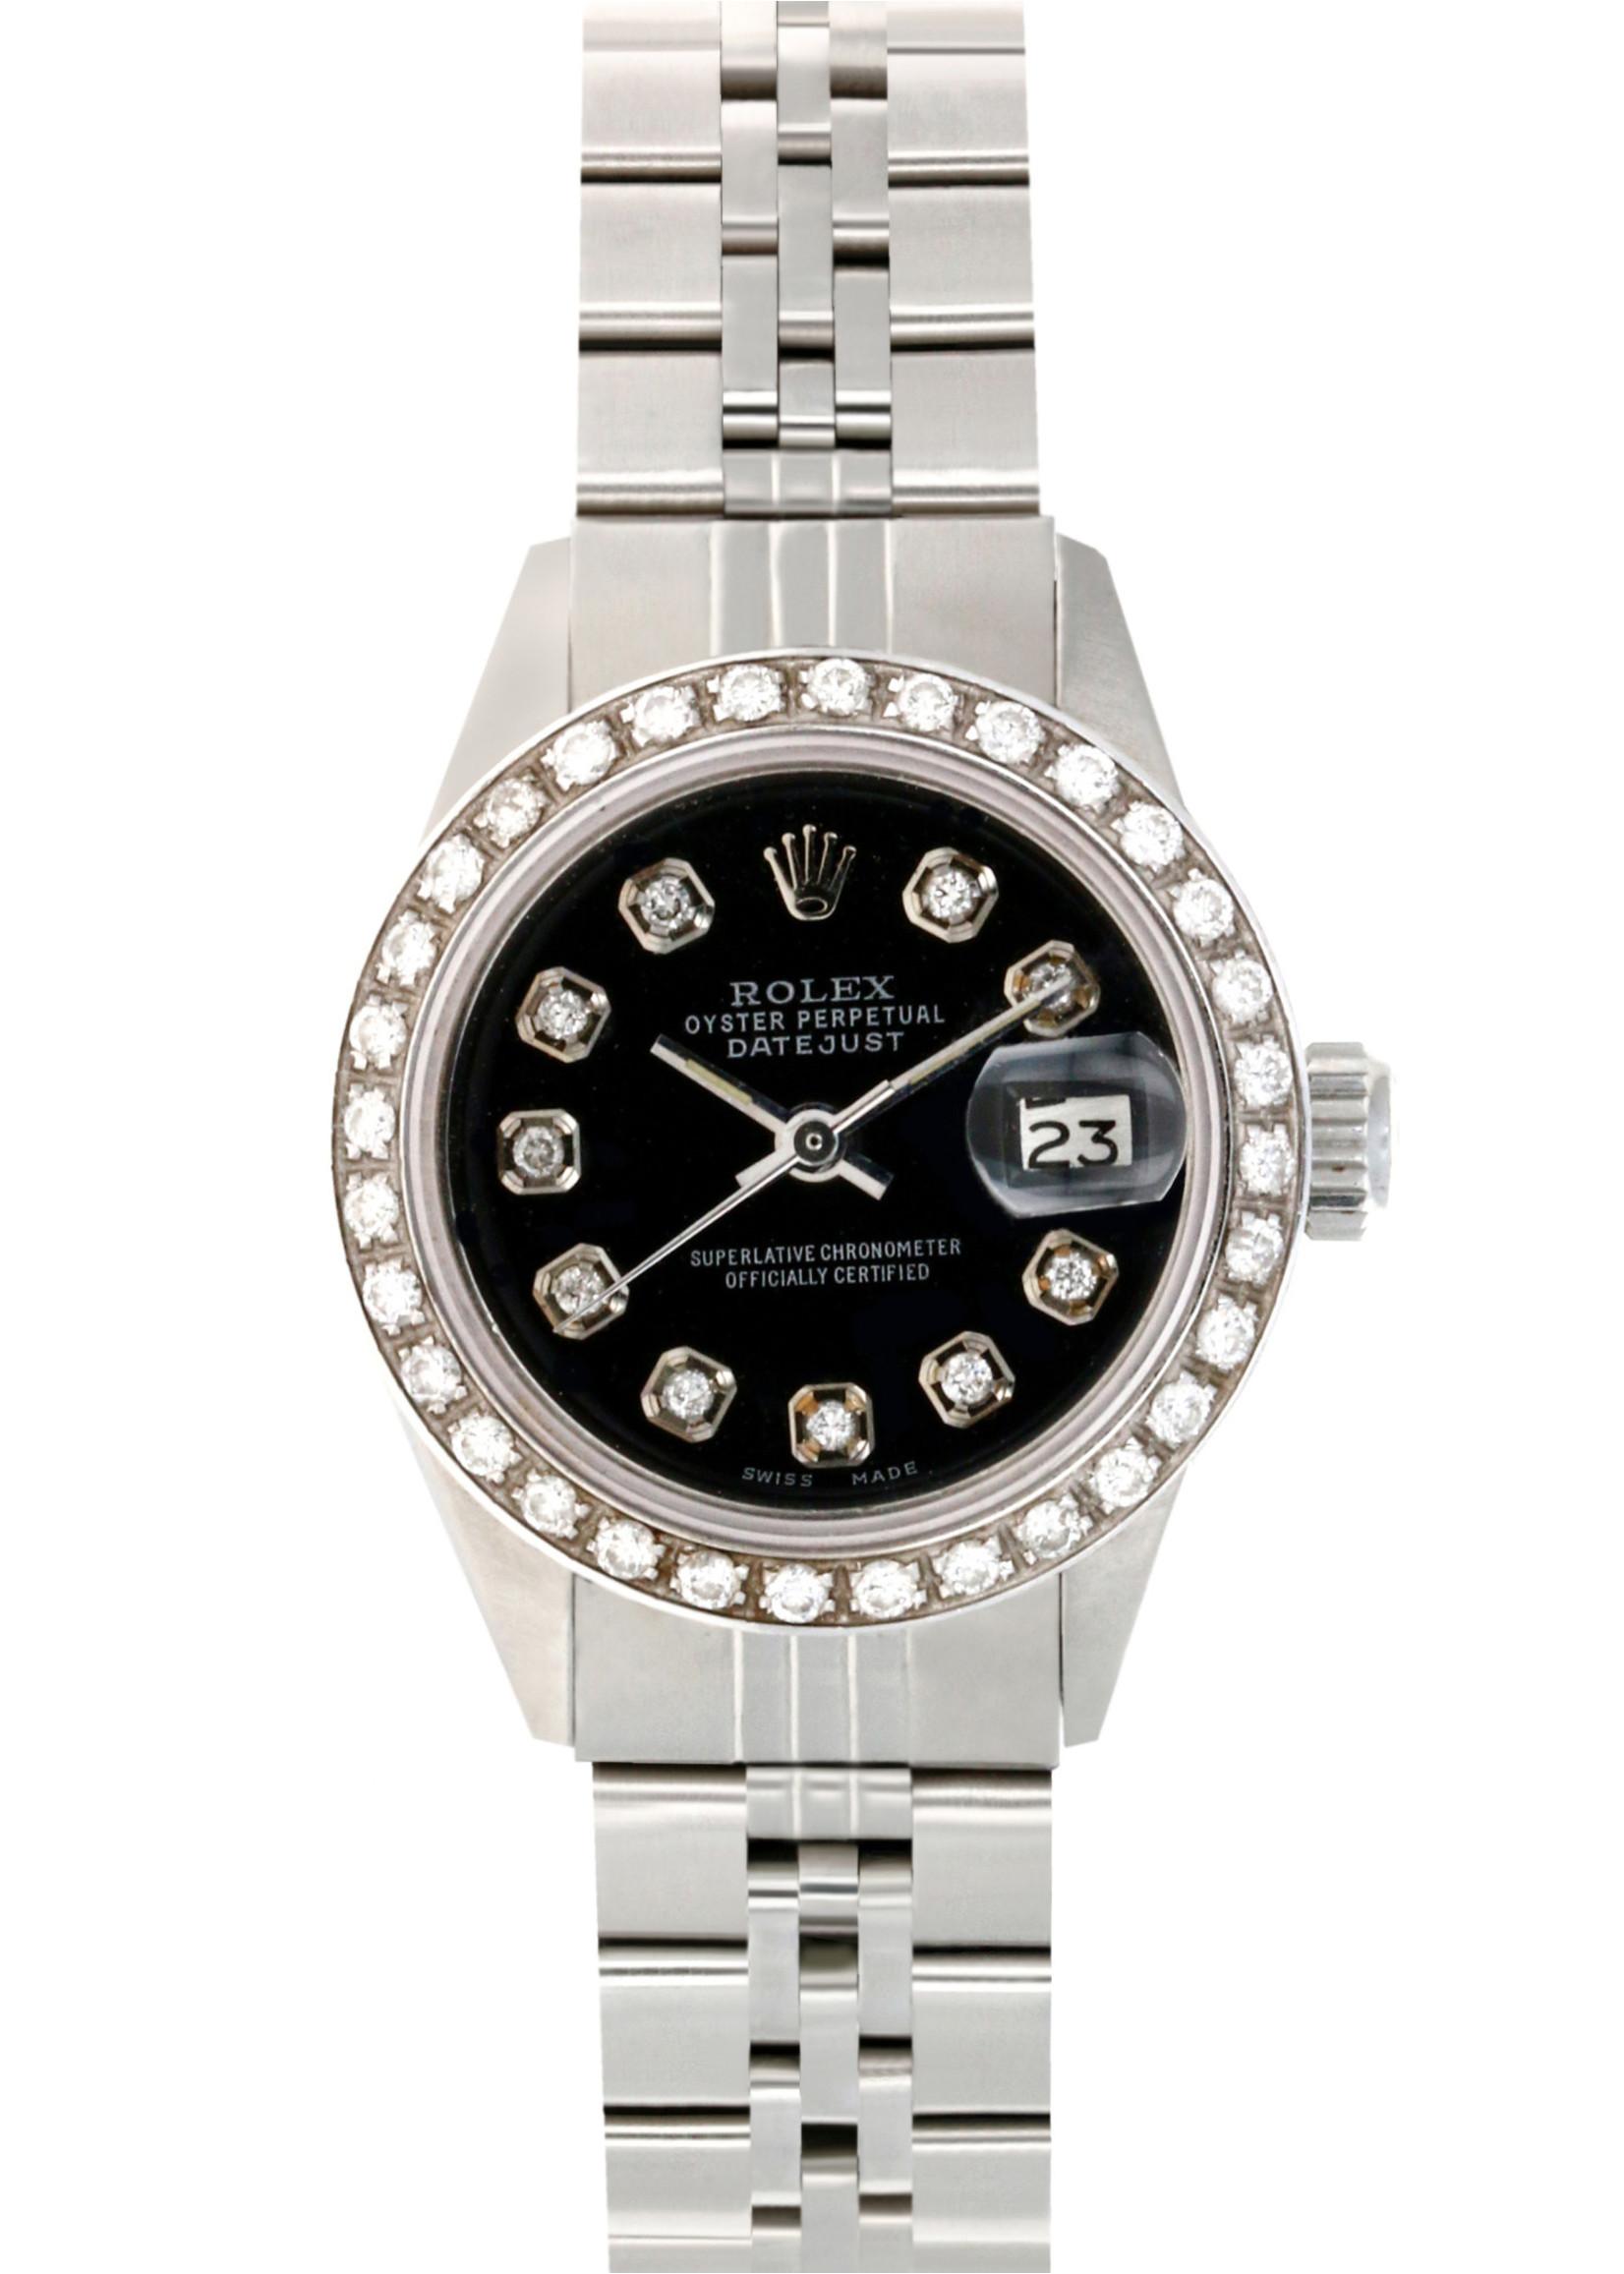 Rolex ROLEX DATEJUST 26MM JUBILEE - CUSTOM DIAMOND DIAL / BEZEL